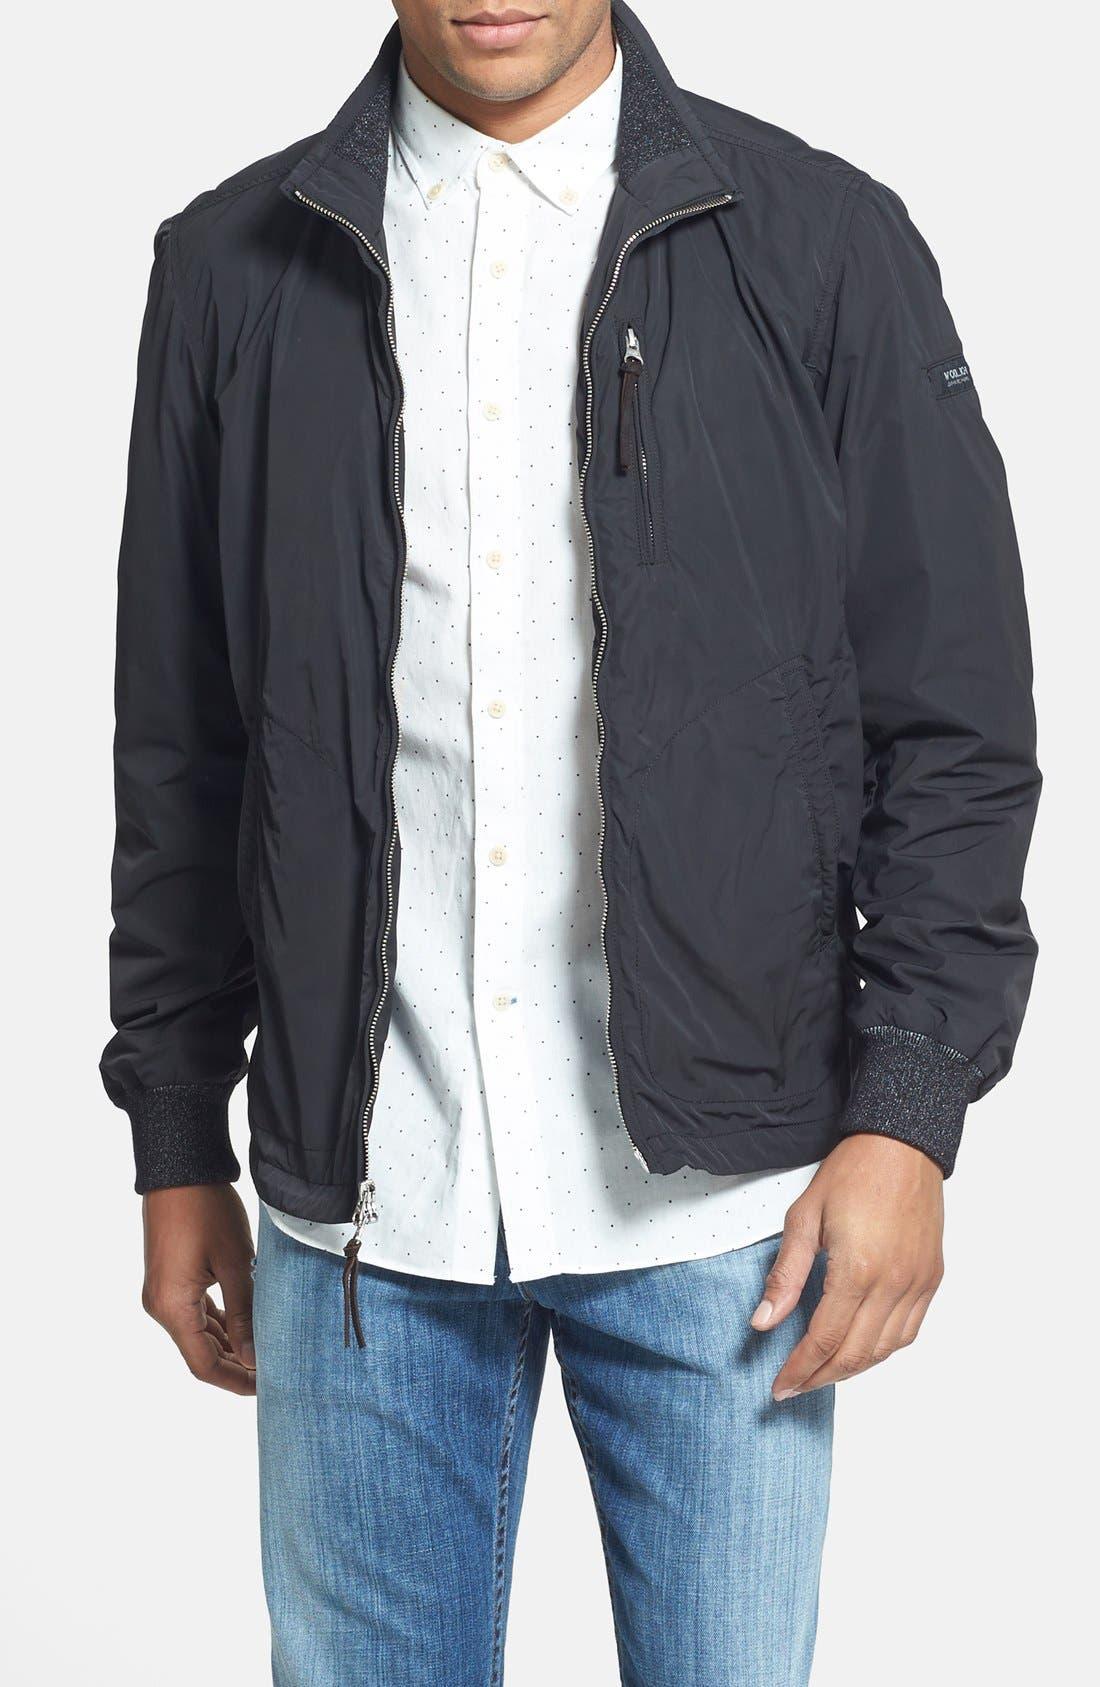 Alternate Image 1 Selected - Woolrich 'Pine' Weather Resistant Moto Jacket